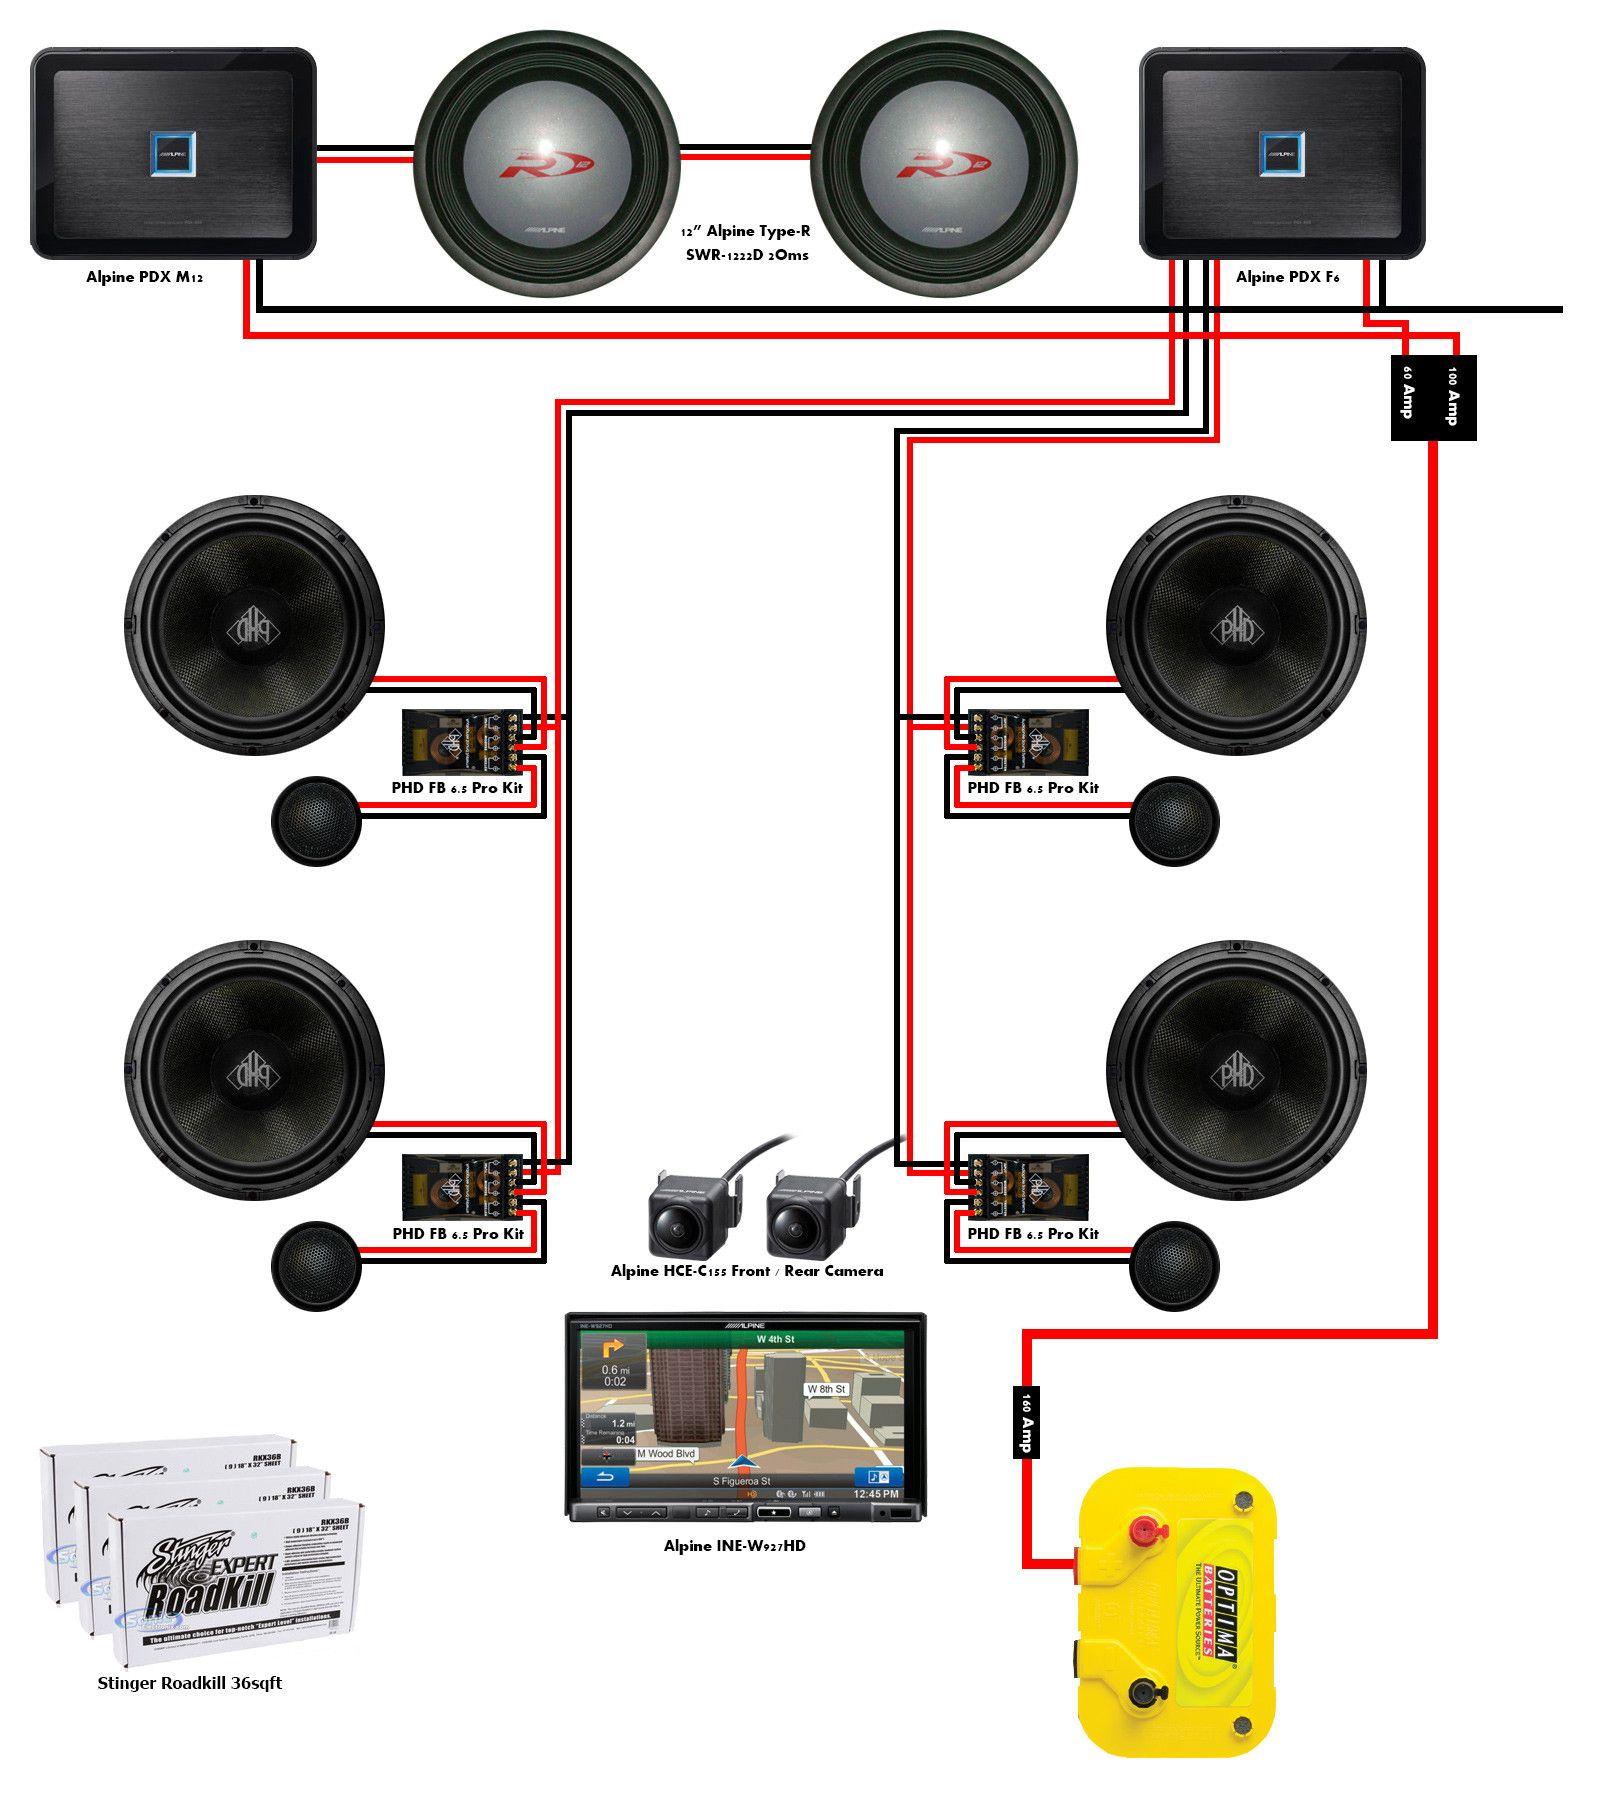 37kozkl Jpg 1600 1800 Car Audio Systems Diy Car Audio Diy Car Audio